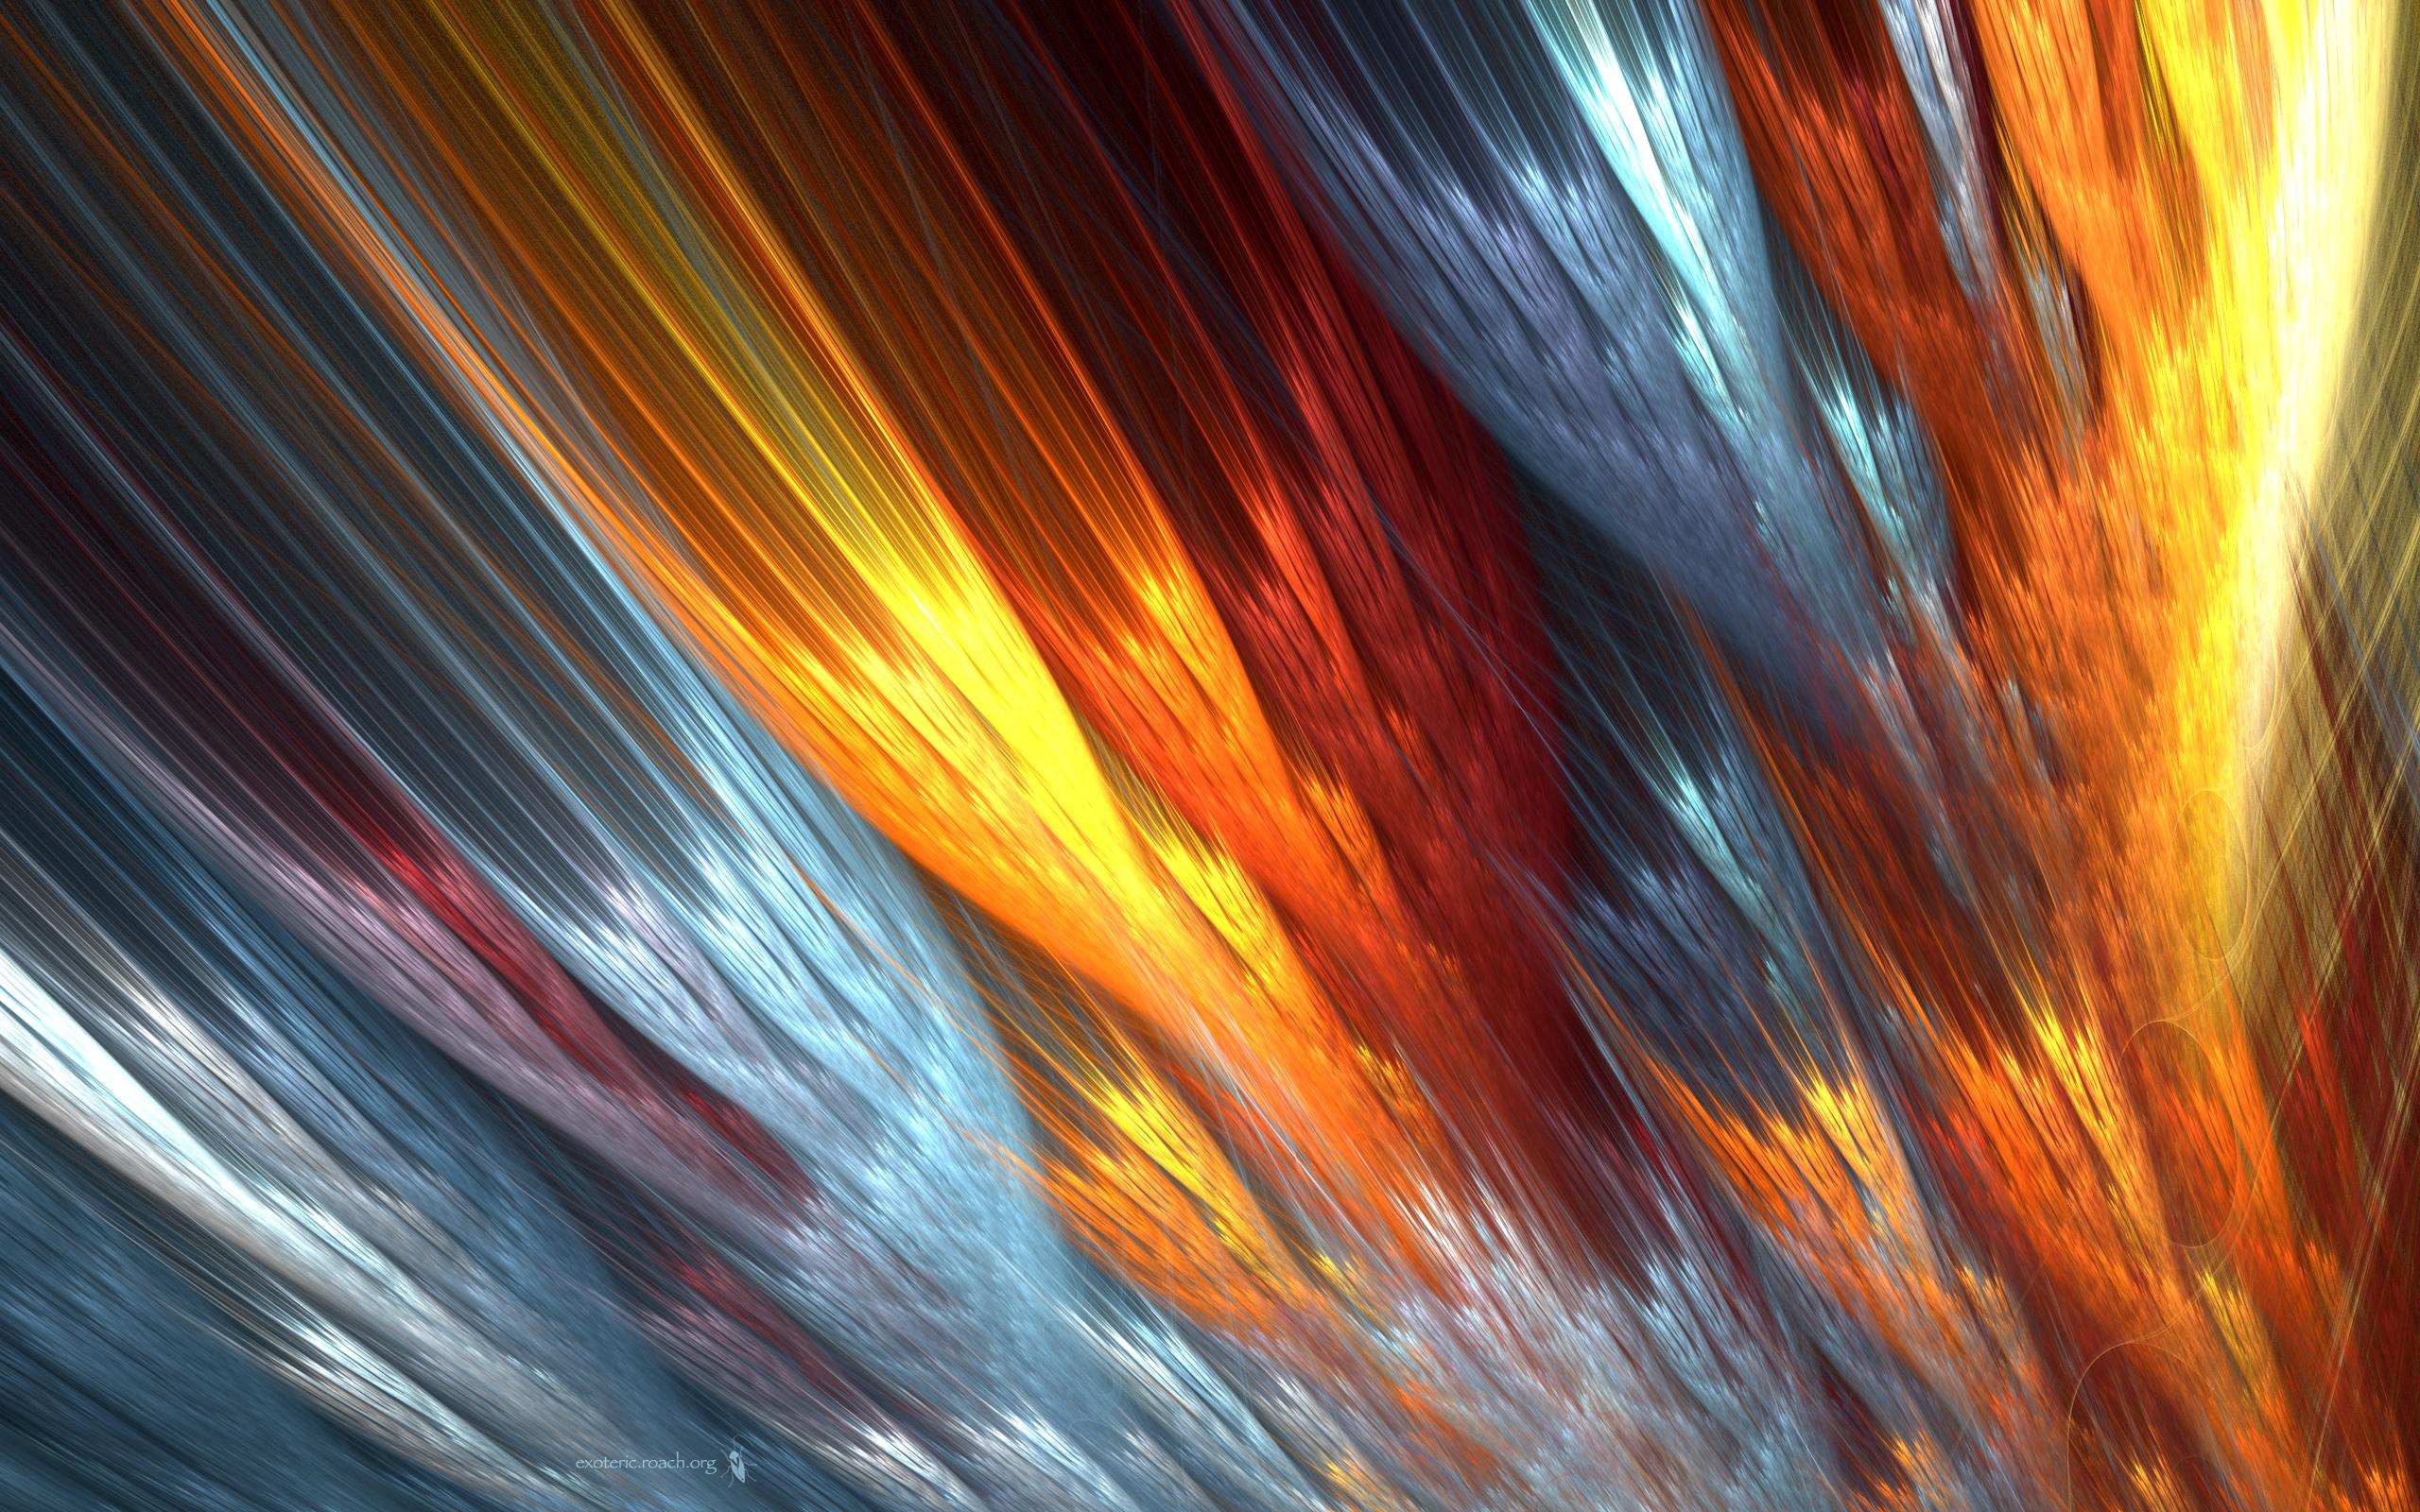 Abstract Art 396